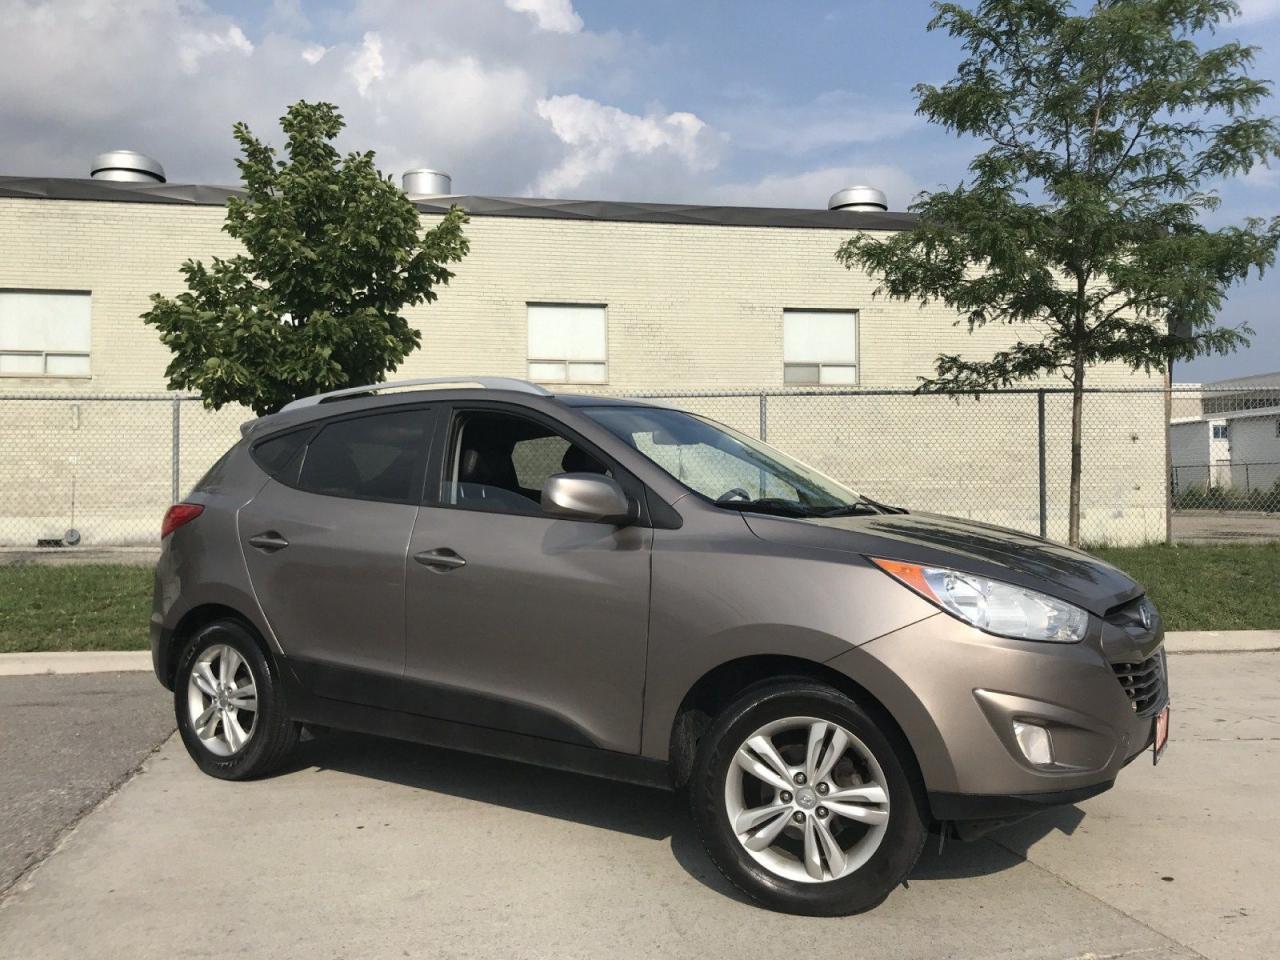 2010 Hyundai Tucson GLS, Leather, Auto, 3/Y warranty available